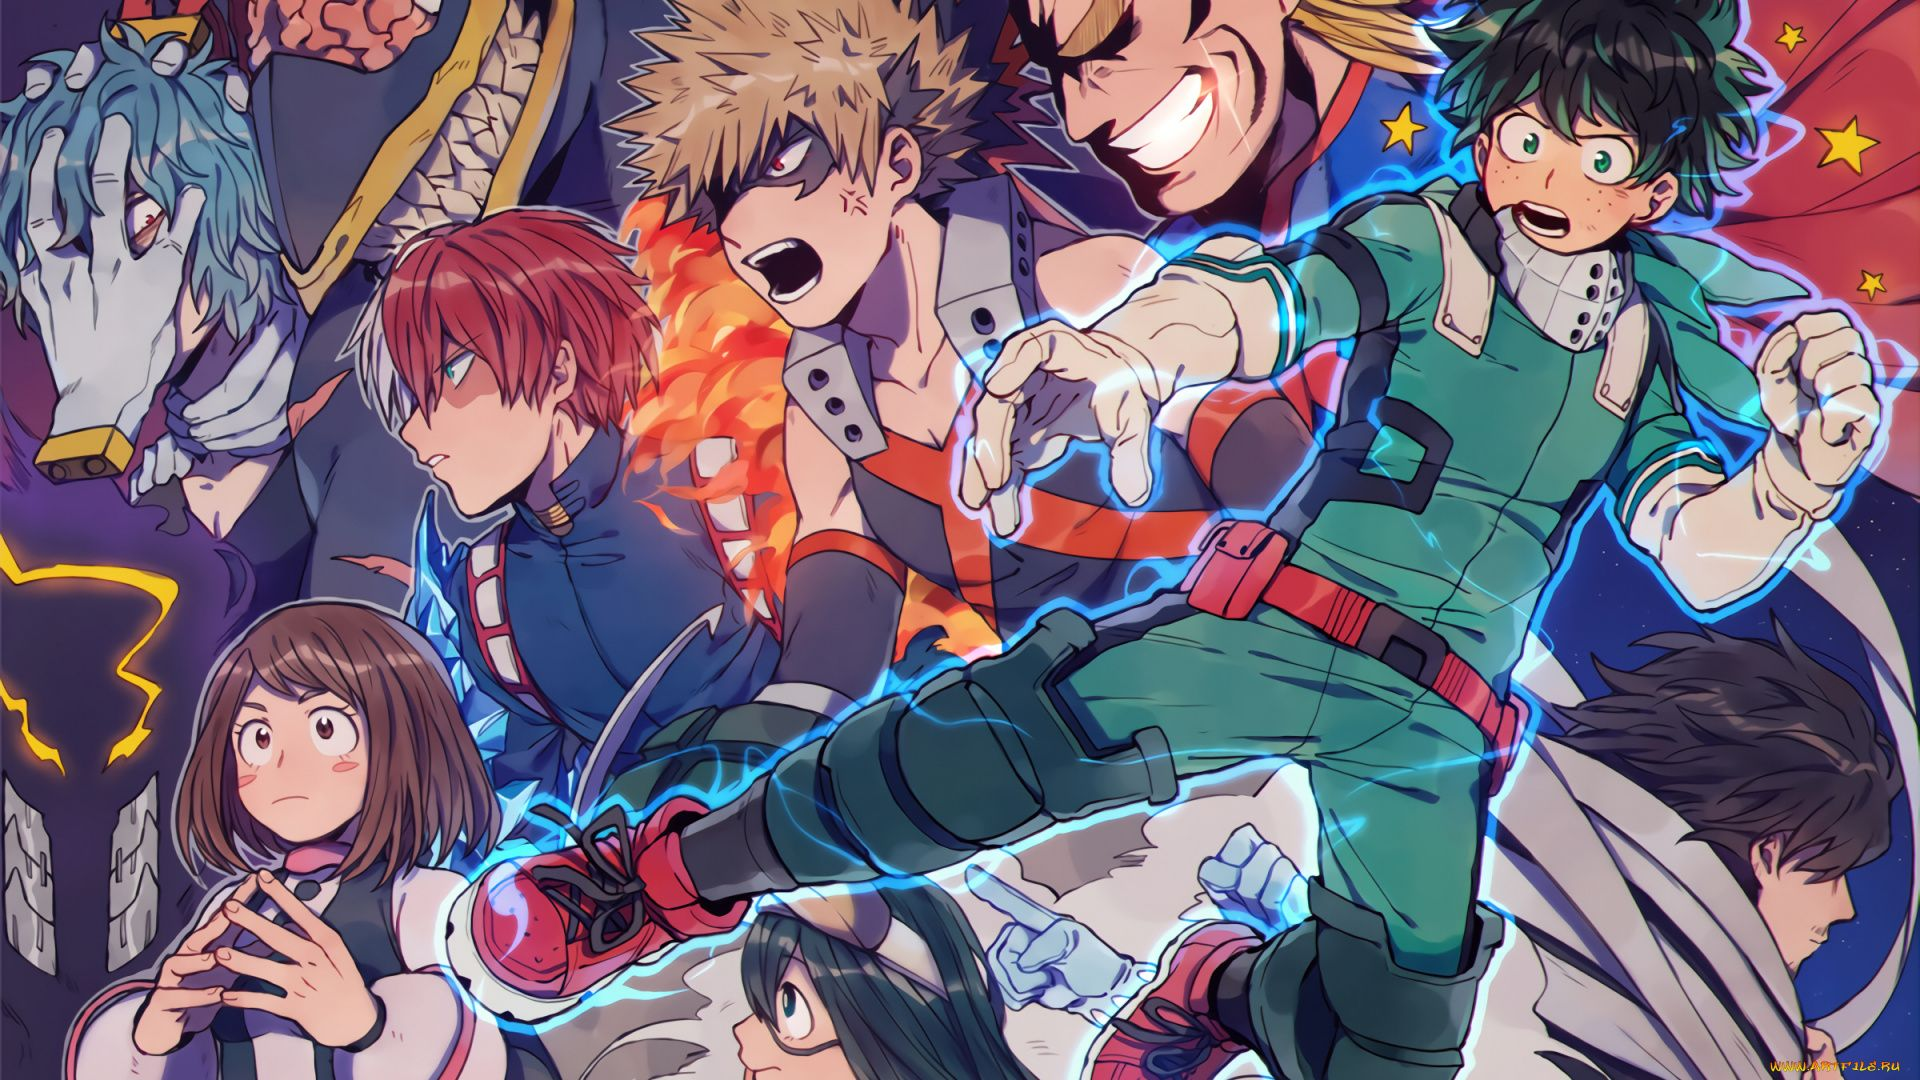 Pictures Anime My Hero Academy